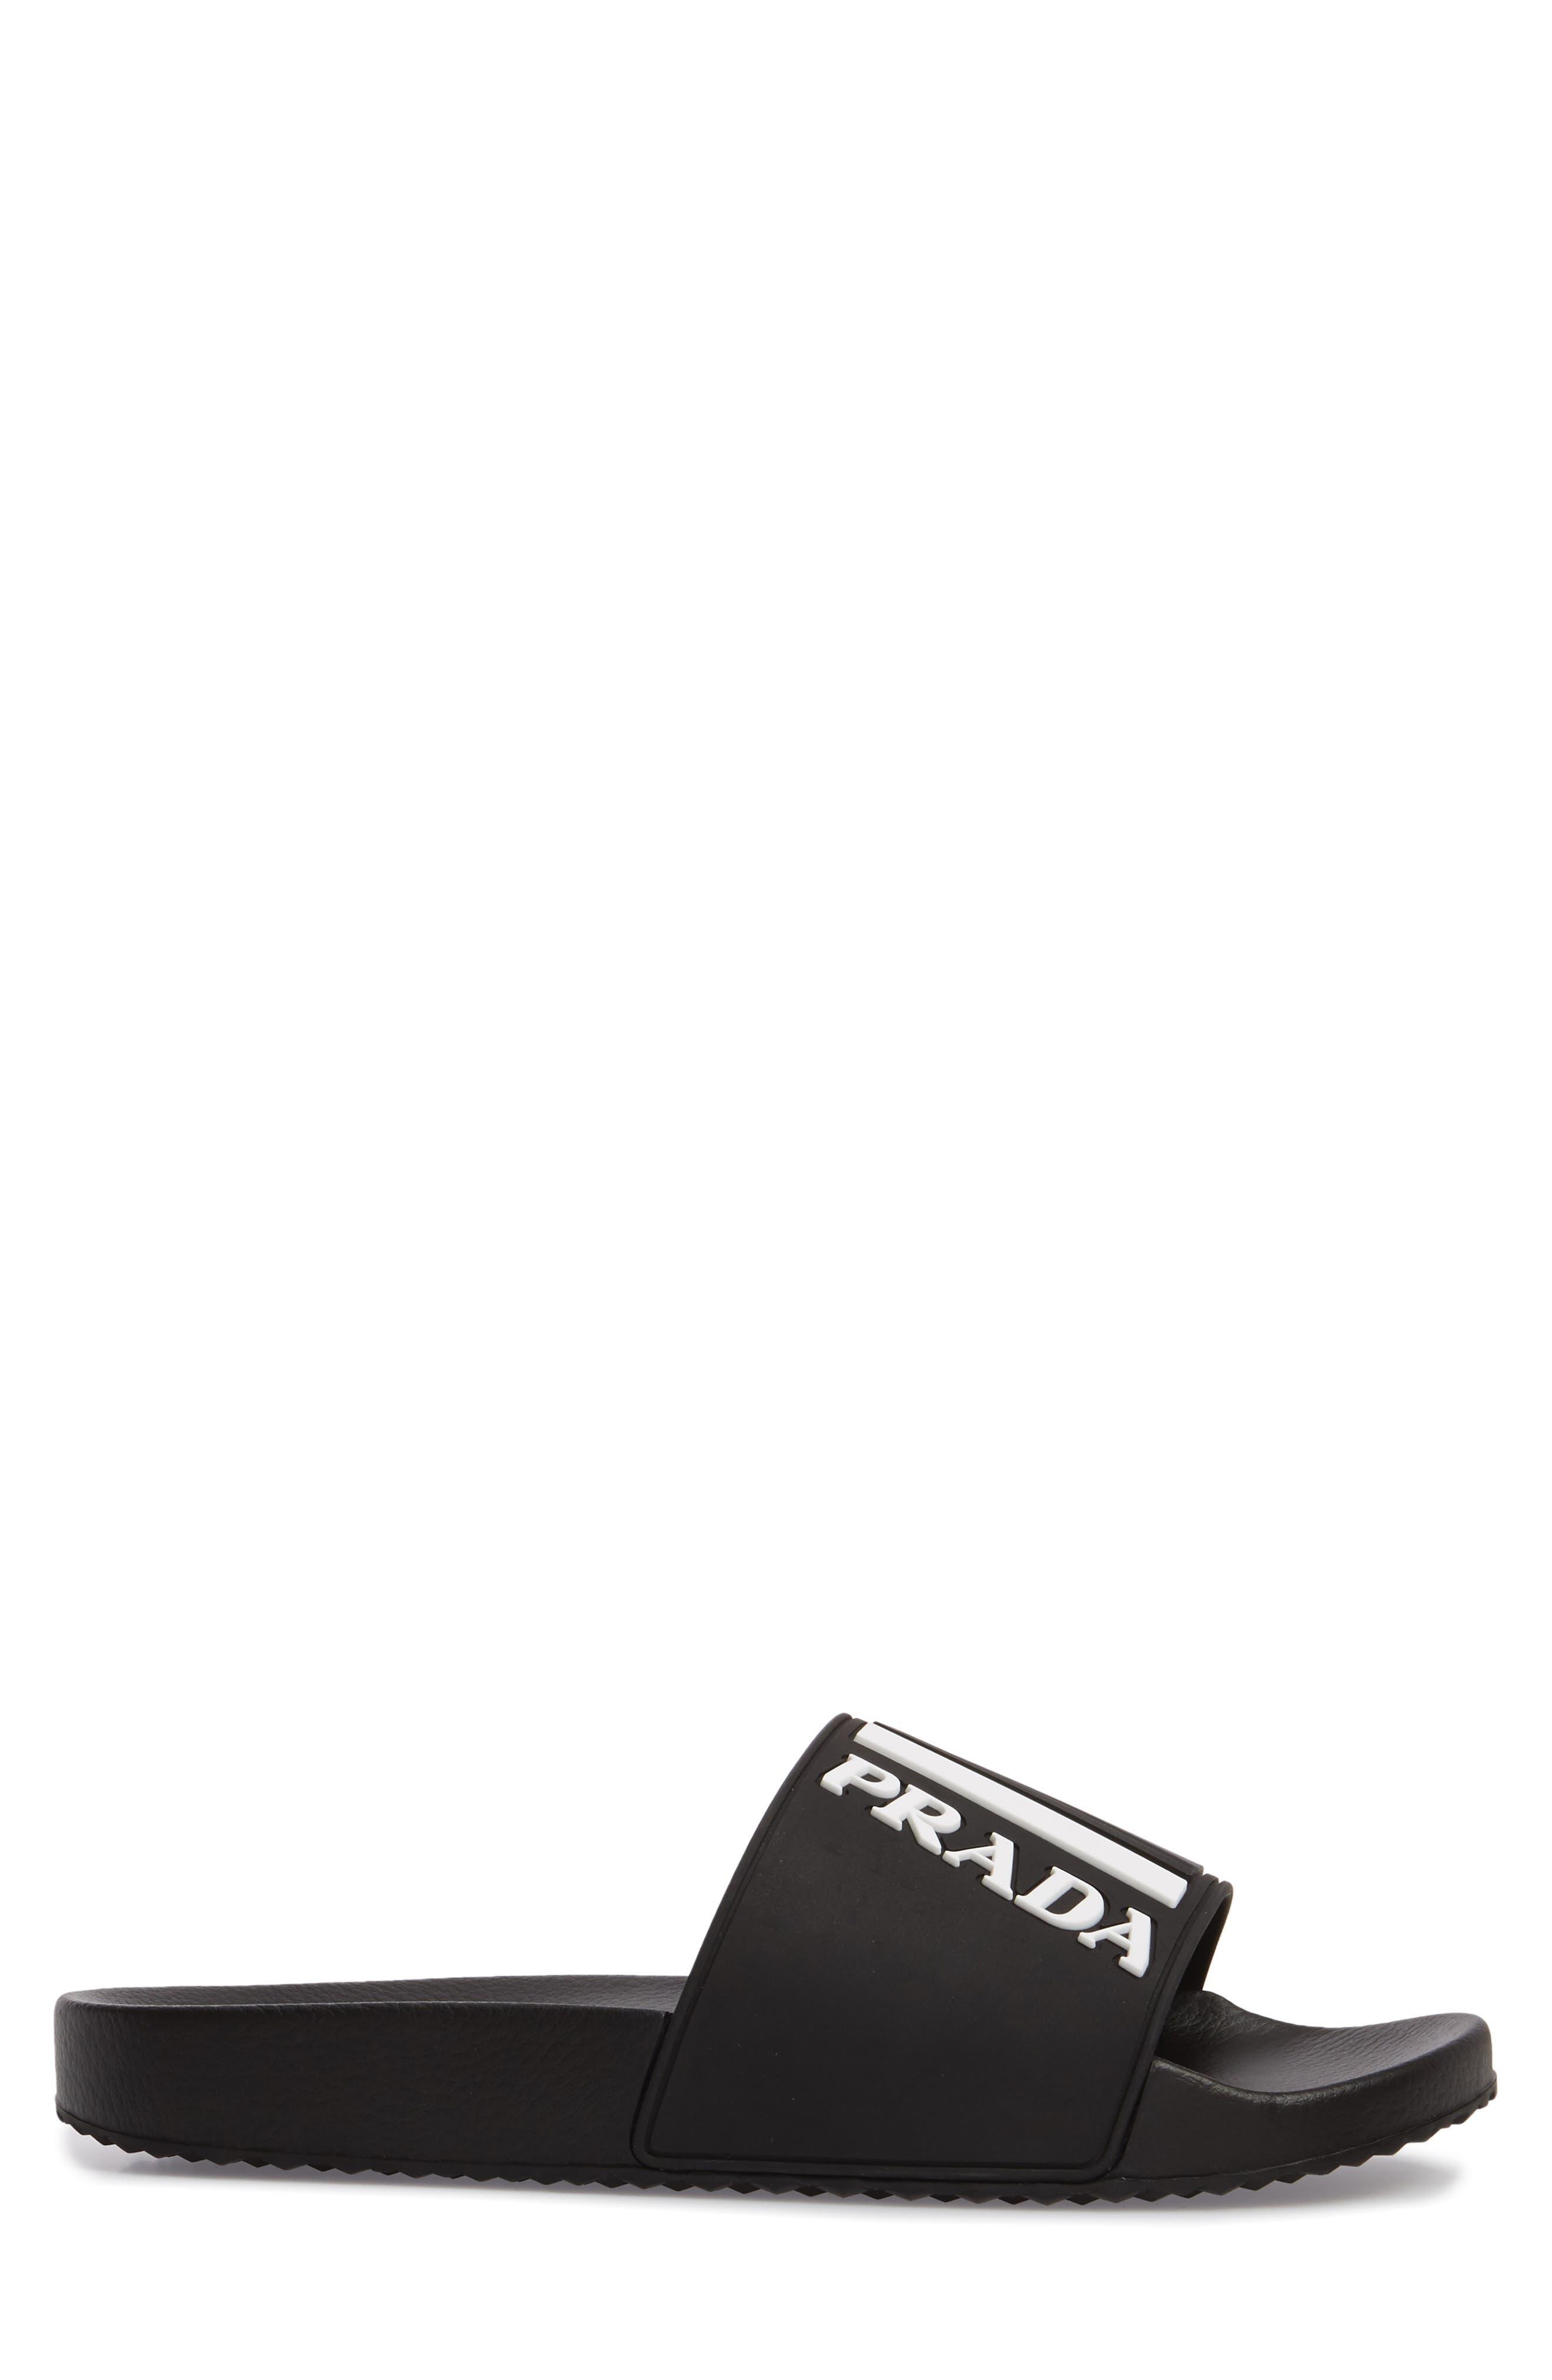 Linea Rossa Logo Slide Sandal,                             Alternate thumbnail 3, color,                             NERO BIANCO